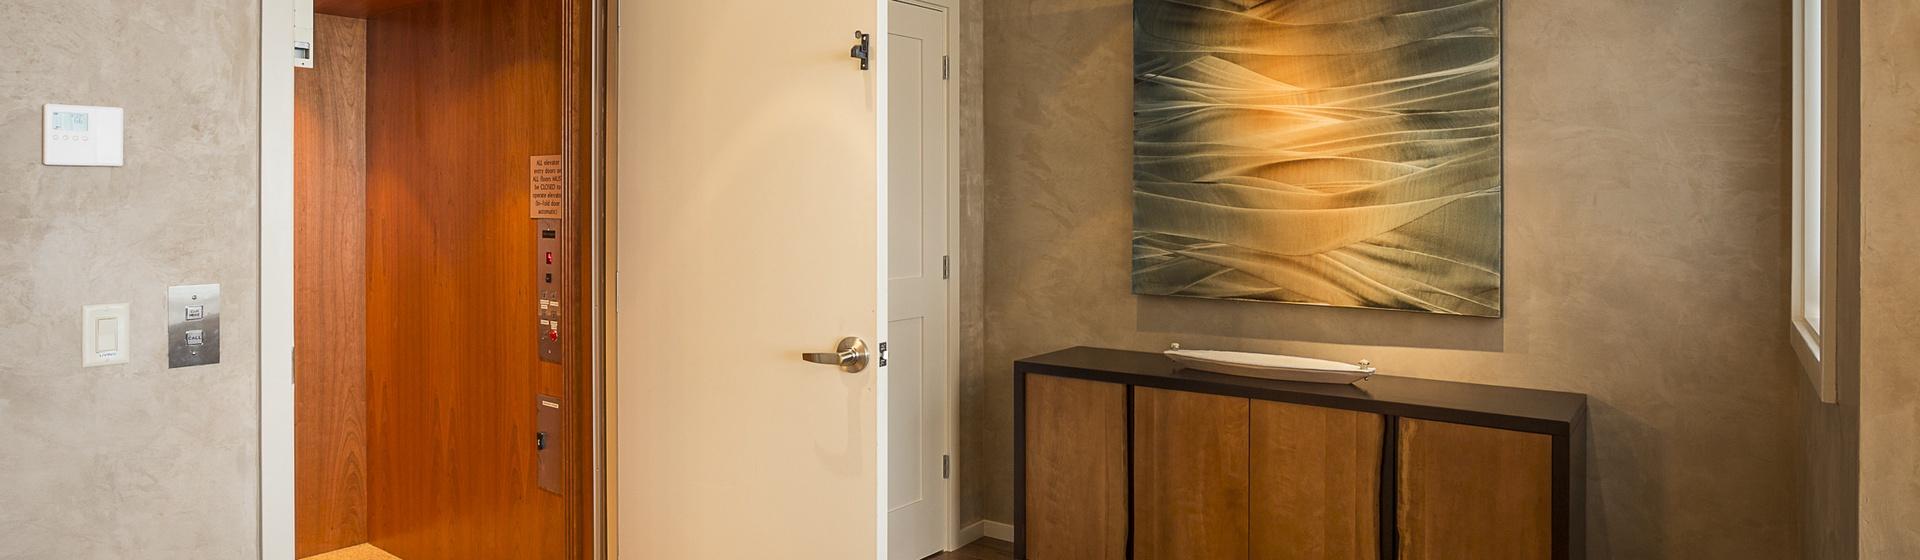 8-Telluride-Trulux-Penthouse-Elevator.jpg